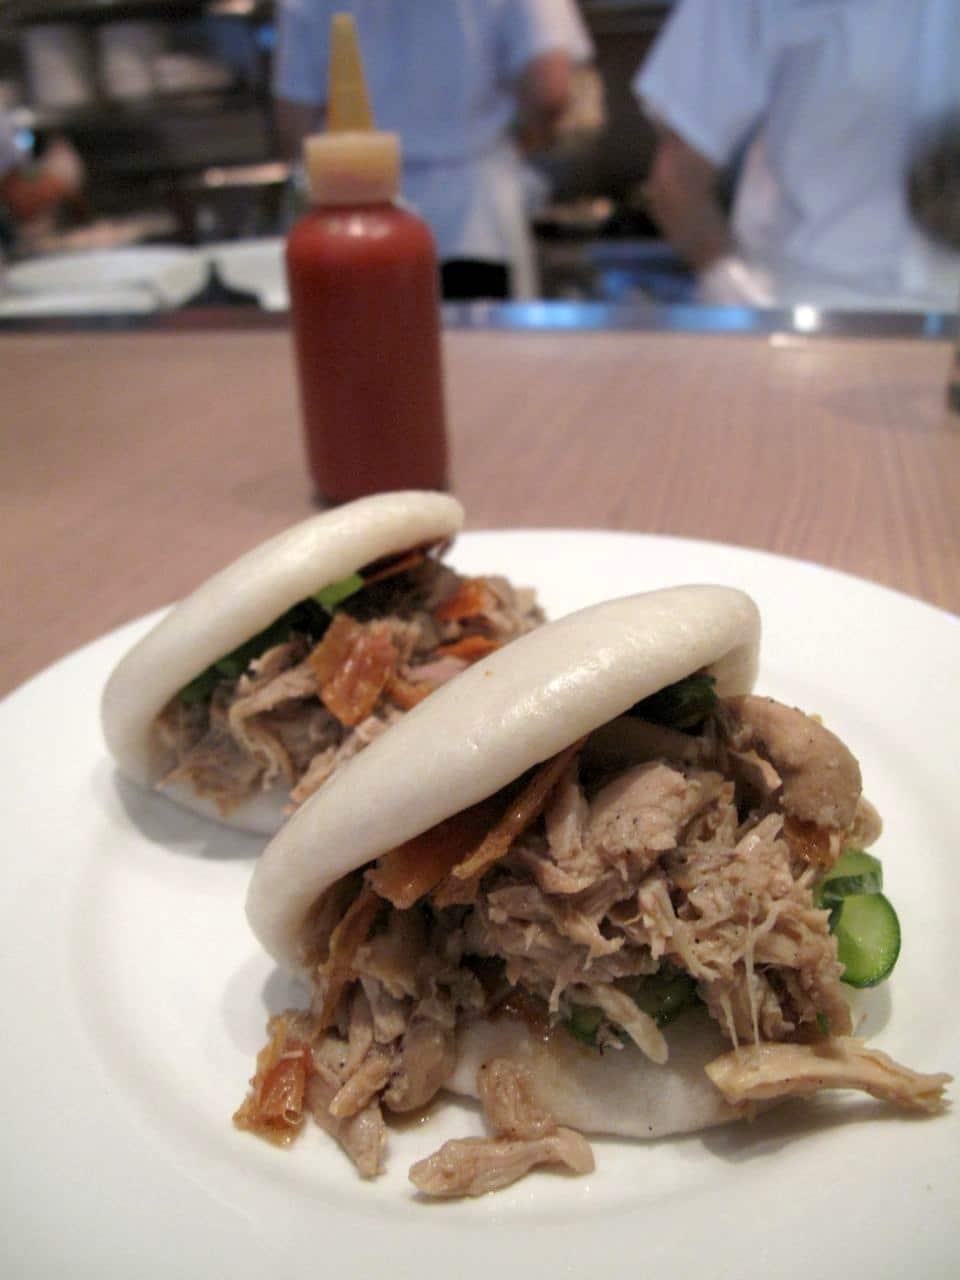 Momofuku Noodle Bar Toronto: Chicken Bun with hoisin, scallion, cucumber